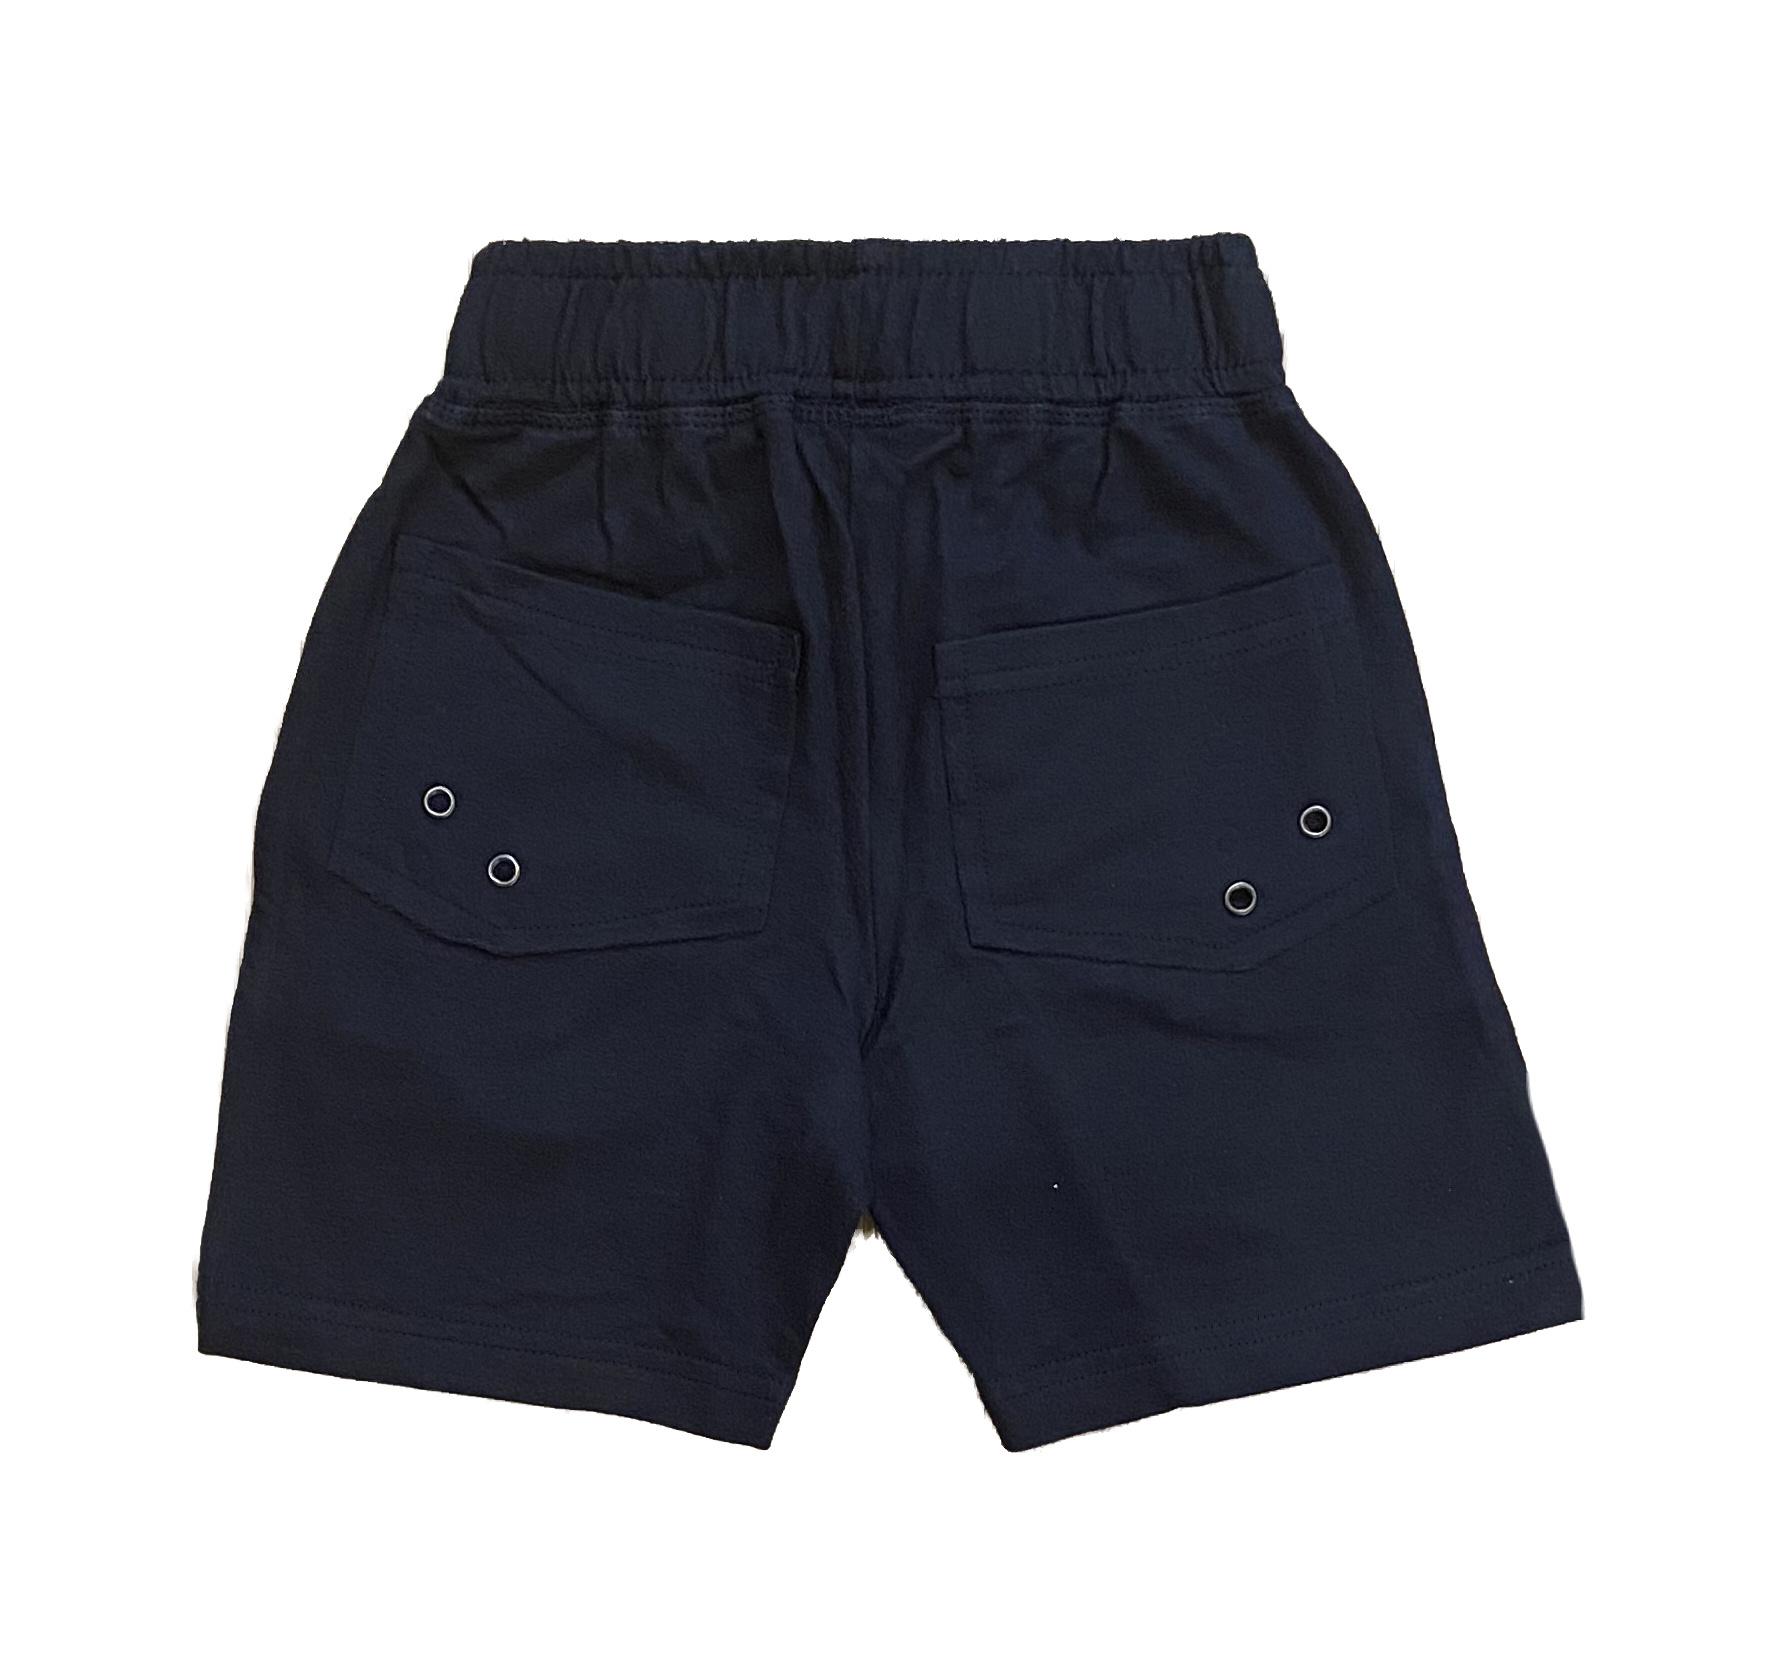 Mish Solid Comfy Pocket Shorts-Navy